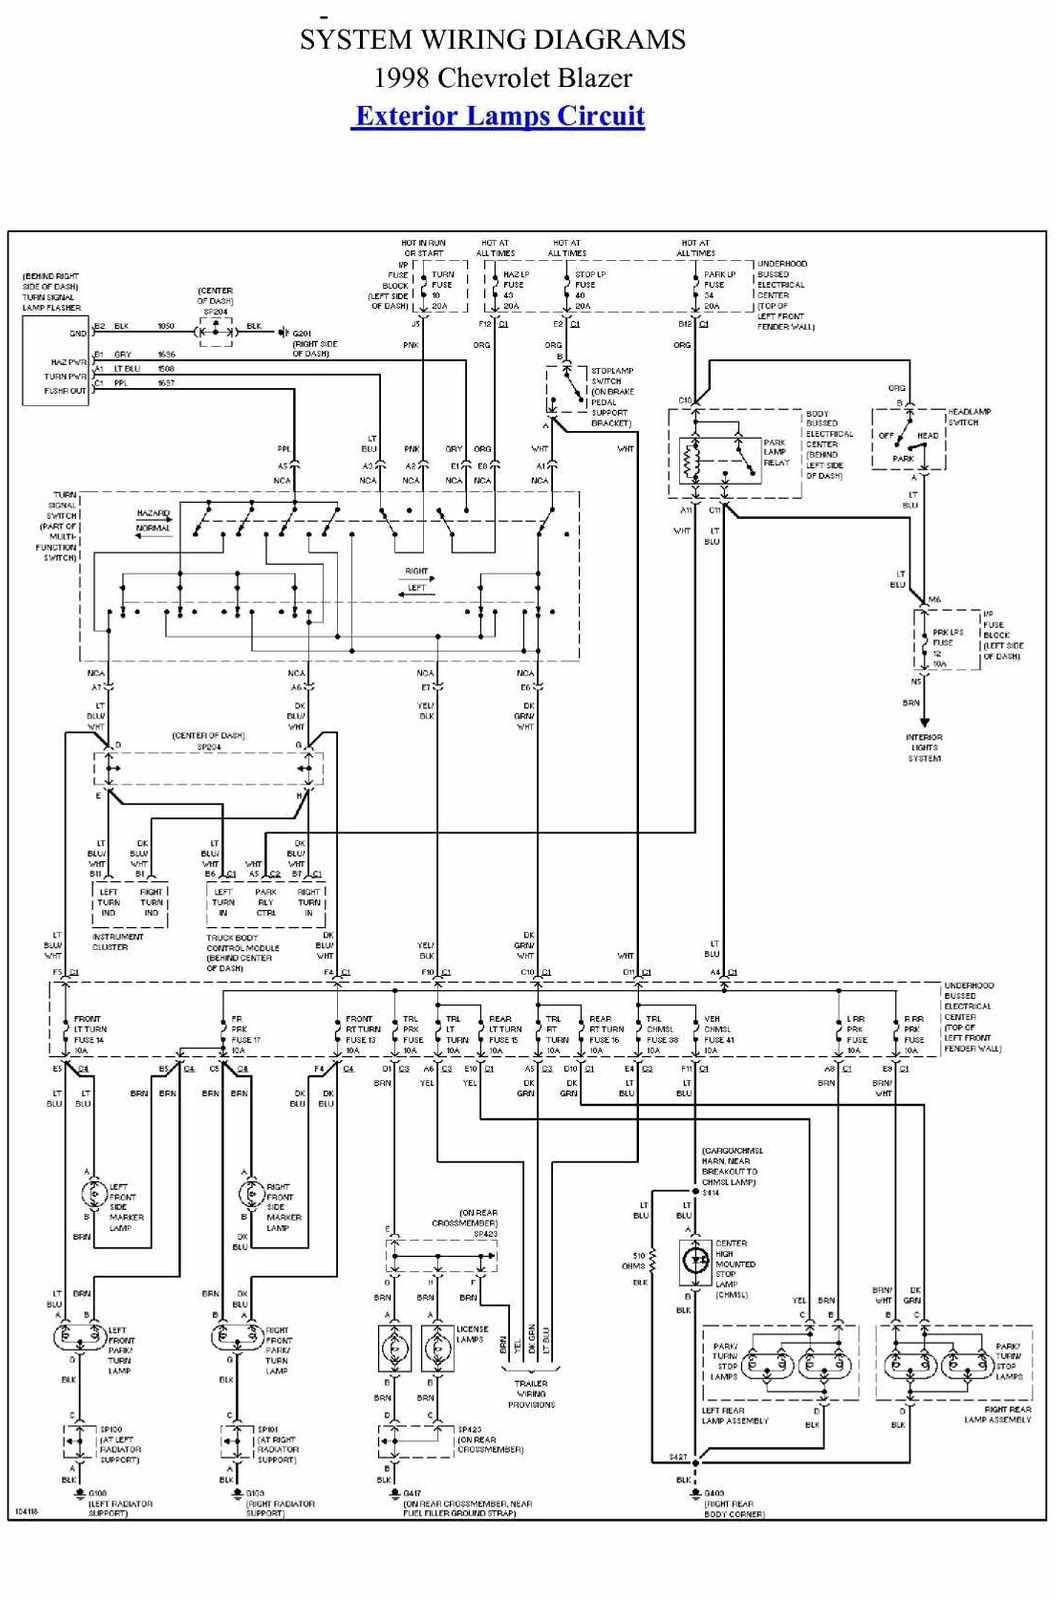 2011 silverado headlight wiring diagram kb 2122  headlight wiring diagram mitsubishi eclipse wiring diagram  headlight wiring diagram mitsubishi